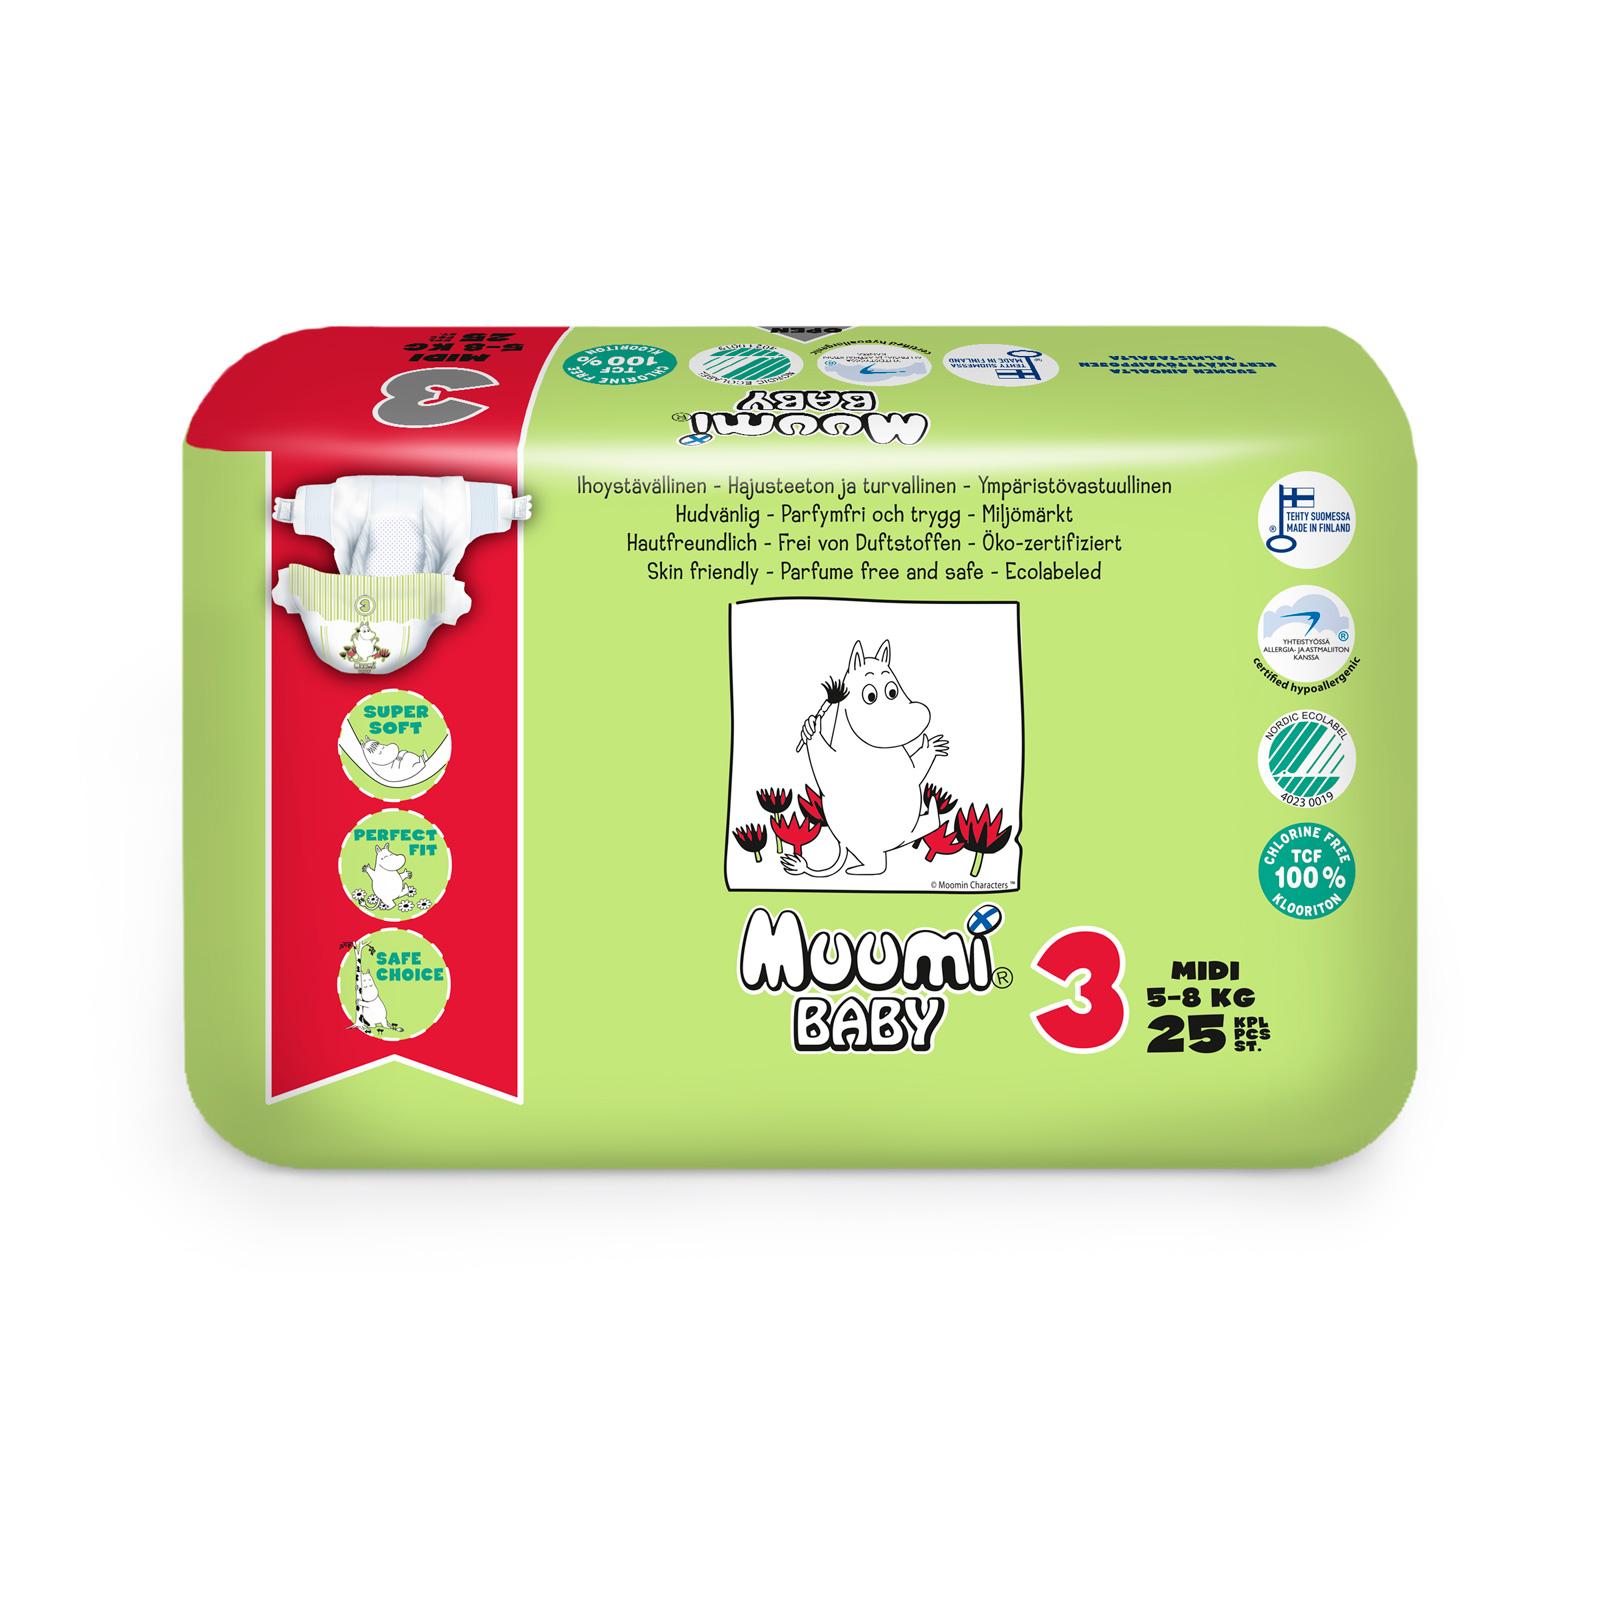 Подгузники Muumi Baby Midi 5-8 кг (25 шт)<br>